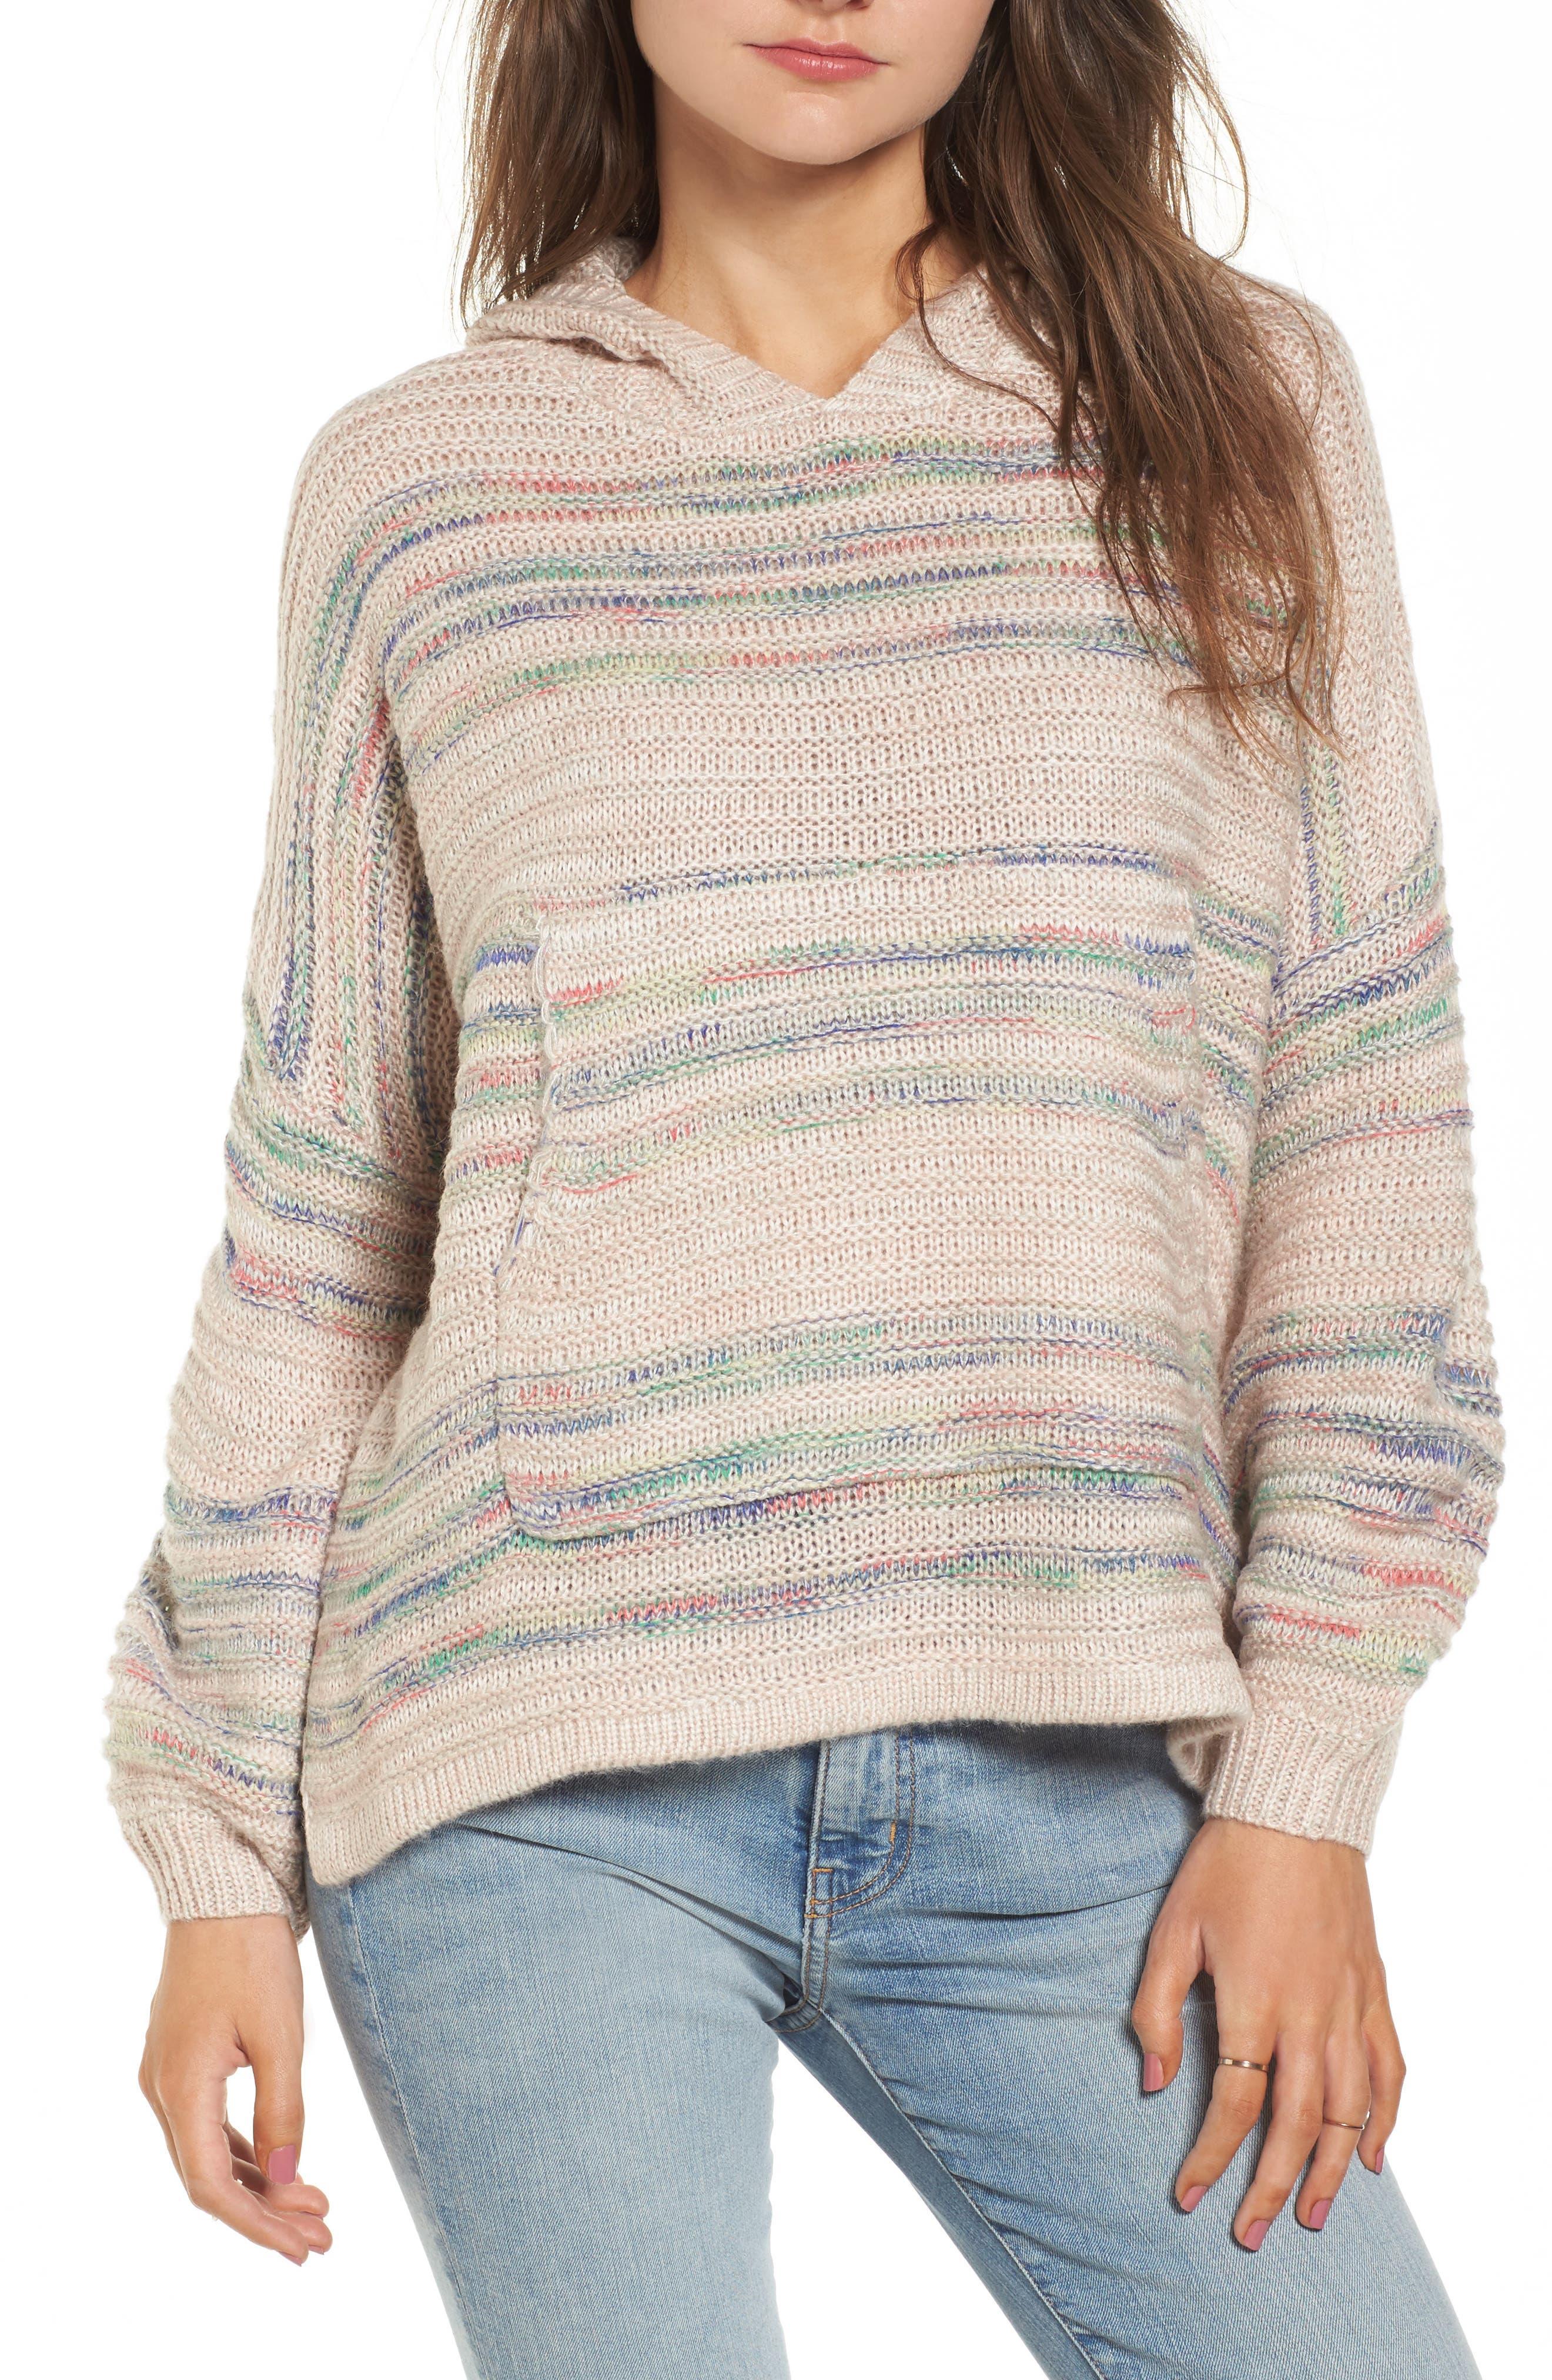 Oversized Sweater Knit Hoodie,                         Main,                         color, Multi Yarn